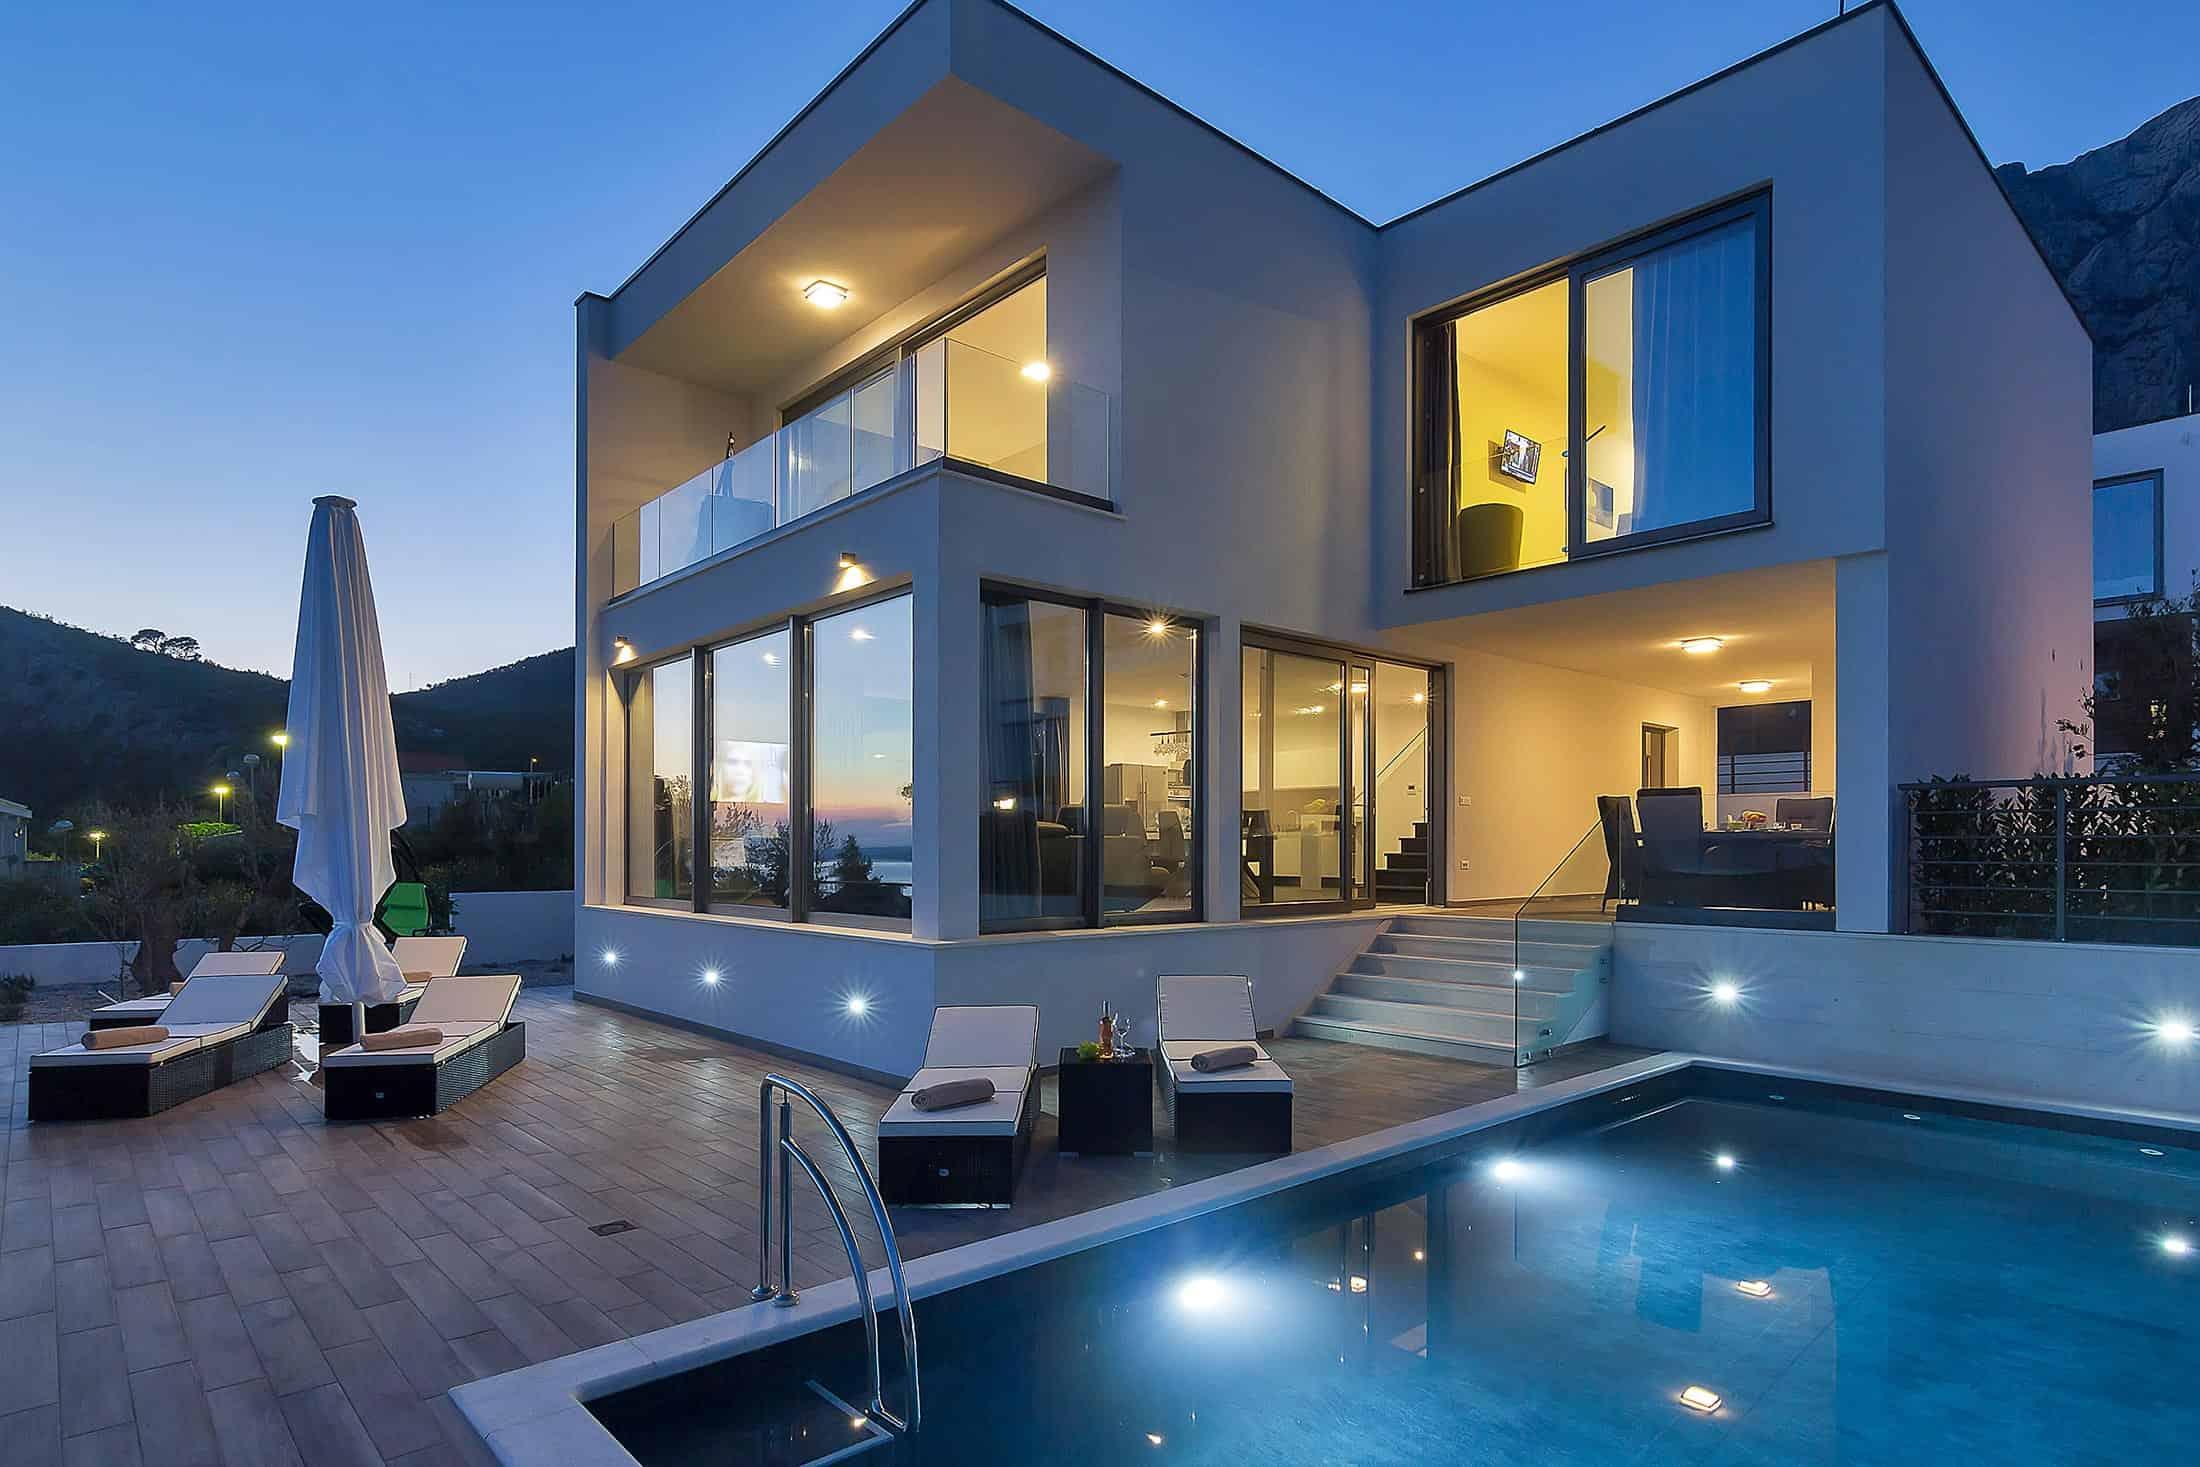 Moderne Villen Mit Privatem Pool Madu Holiday